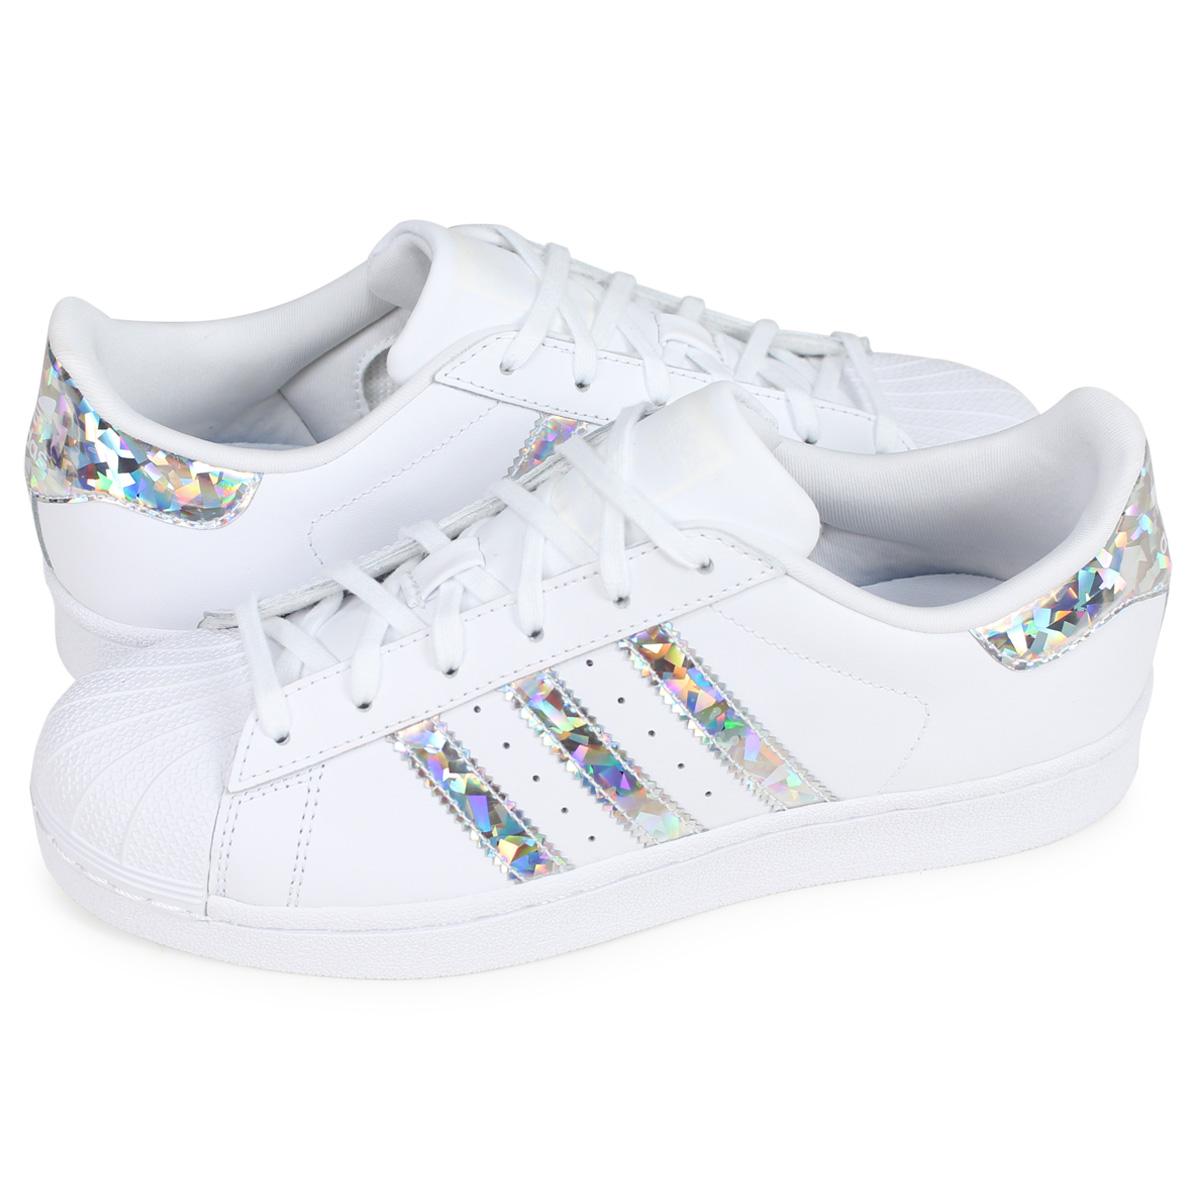 adidas Originals SUPER STAR J Adidas originals